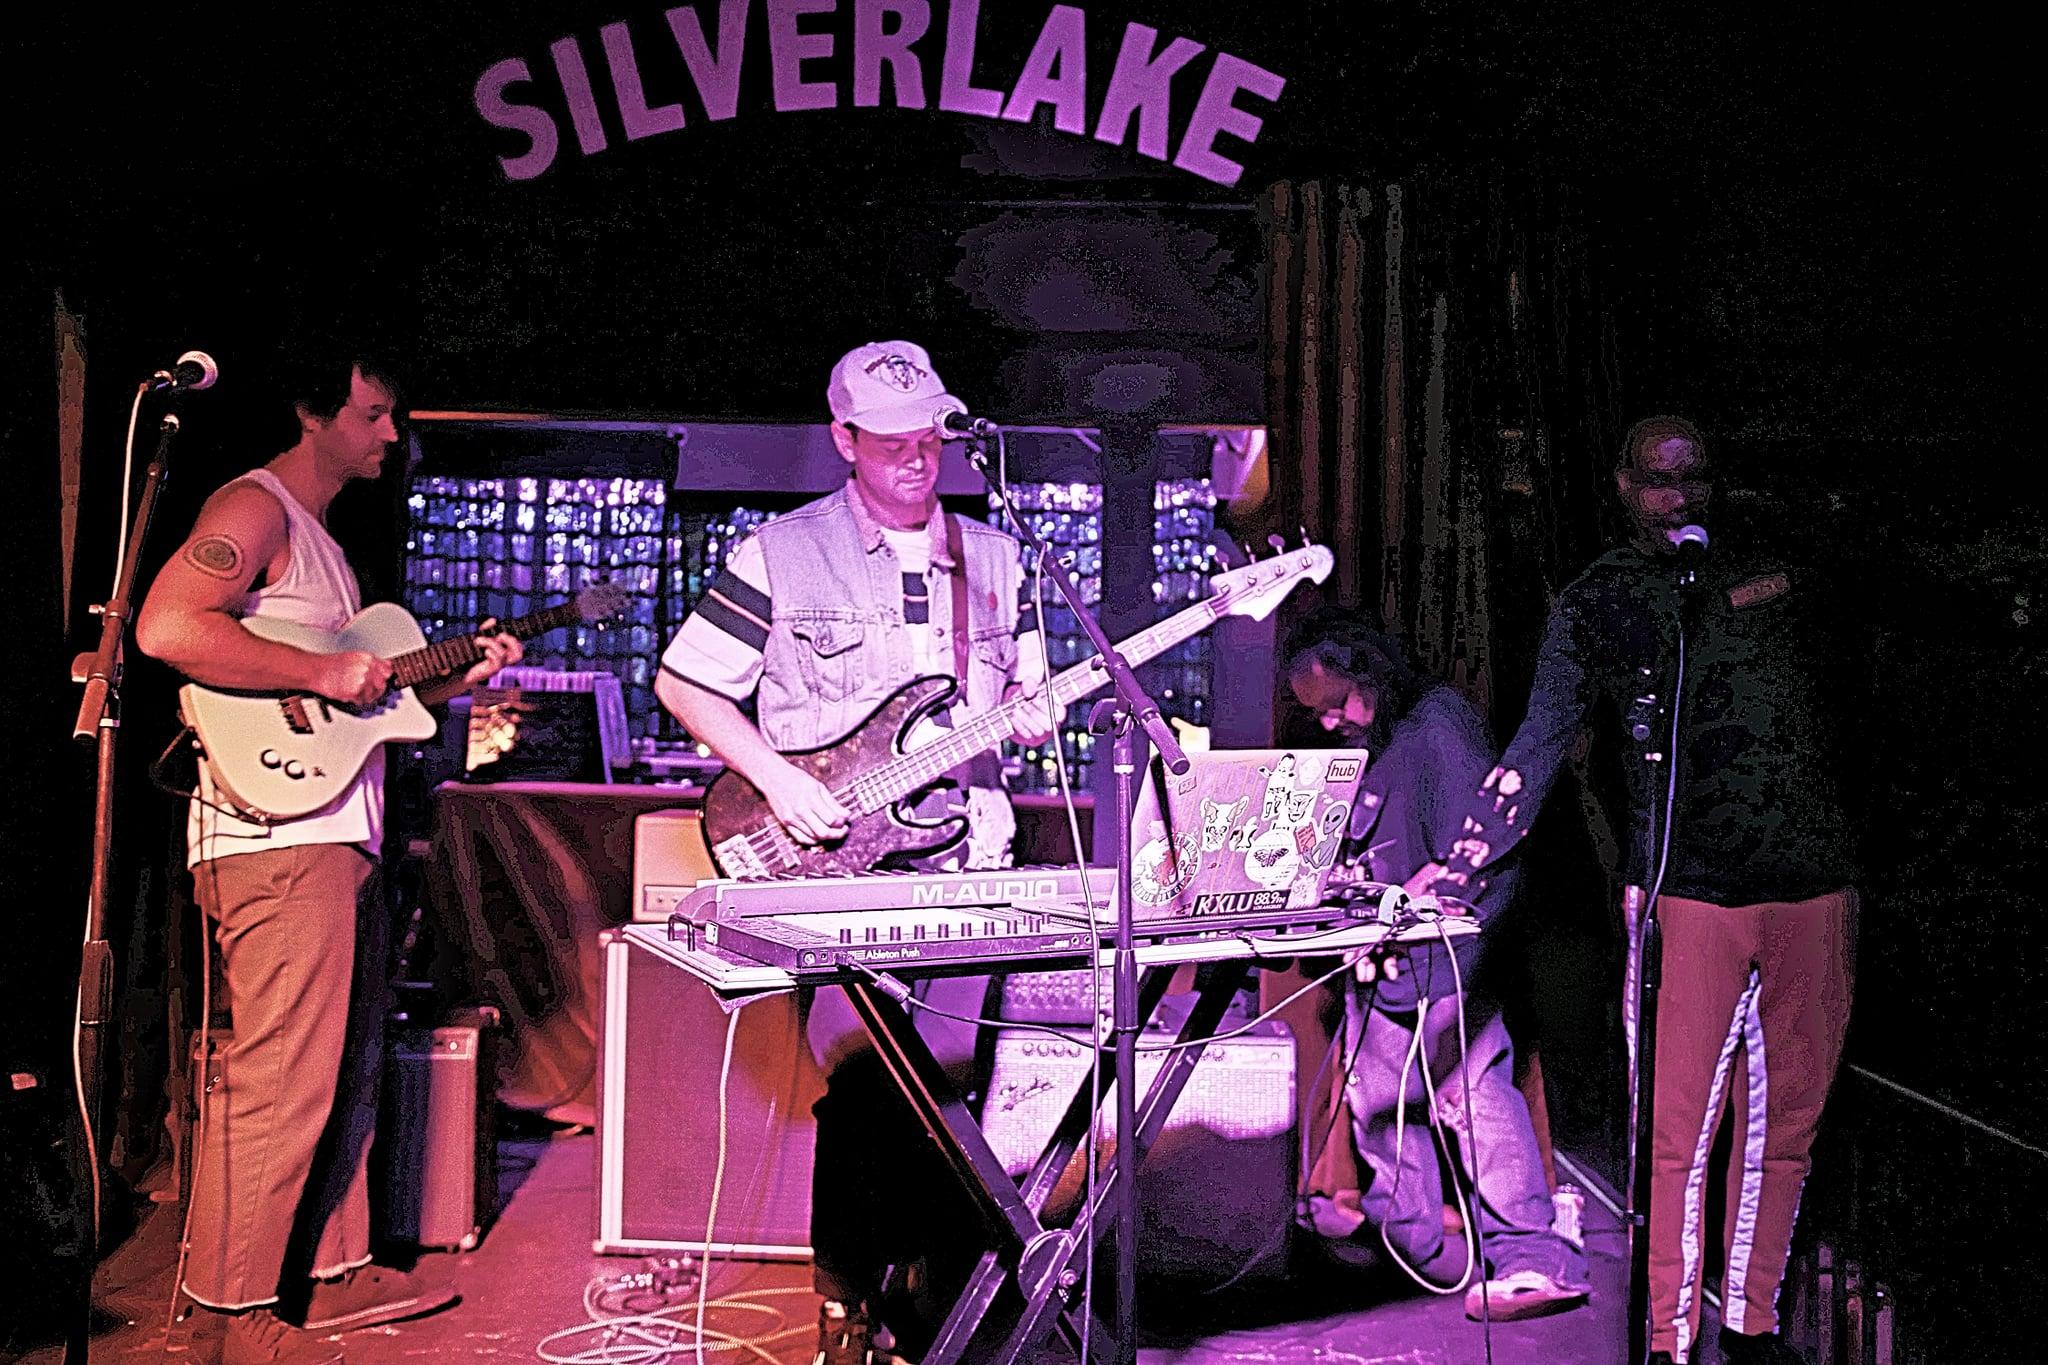 Juggs at the Silverlake Lounge